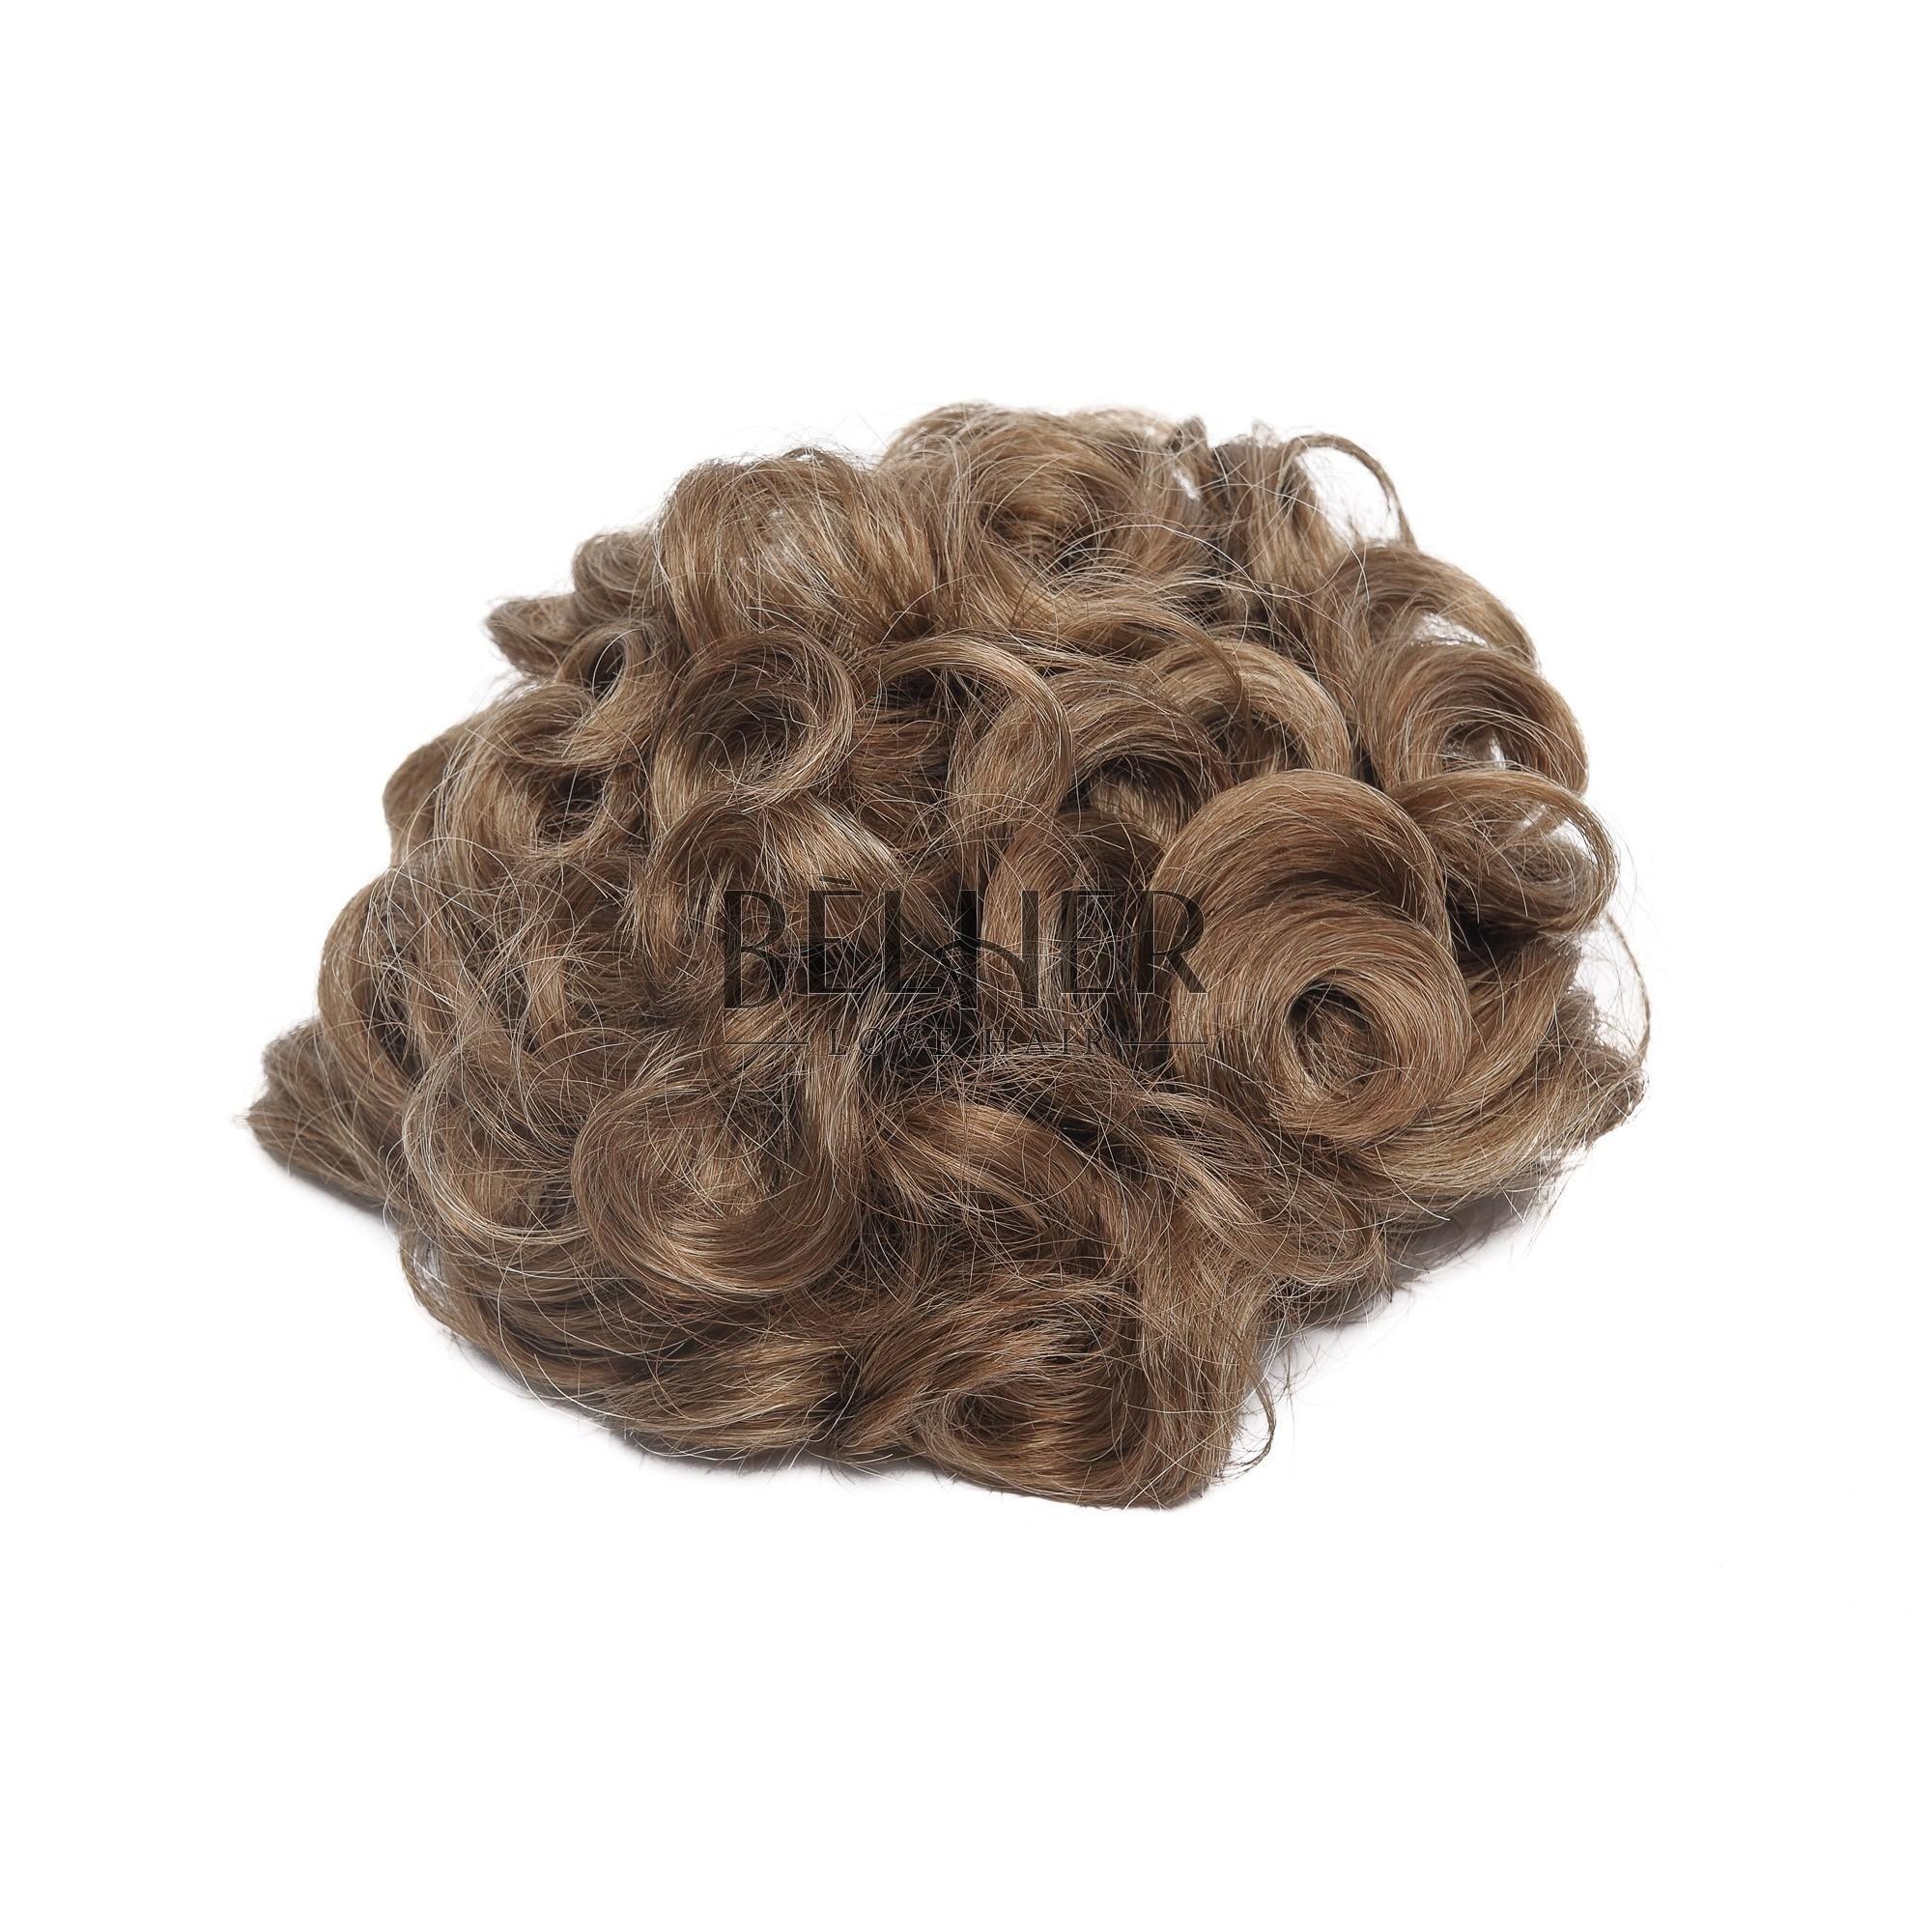 Coc Bucle Blond Aluna